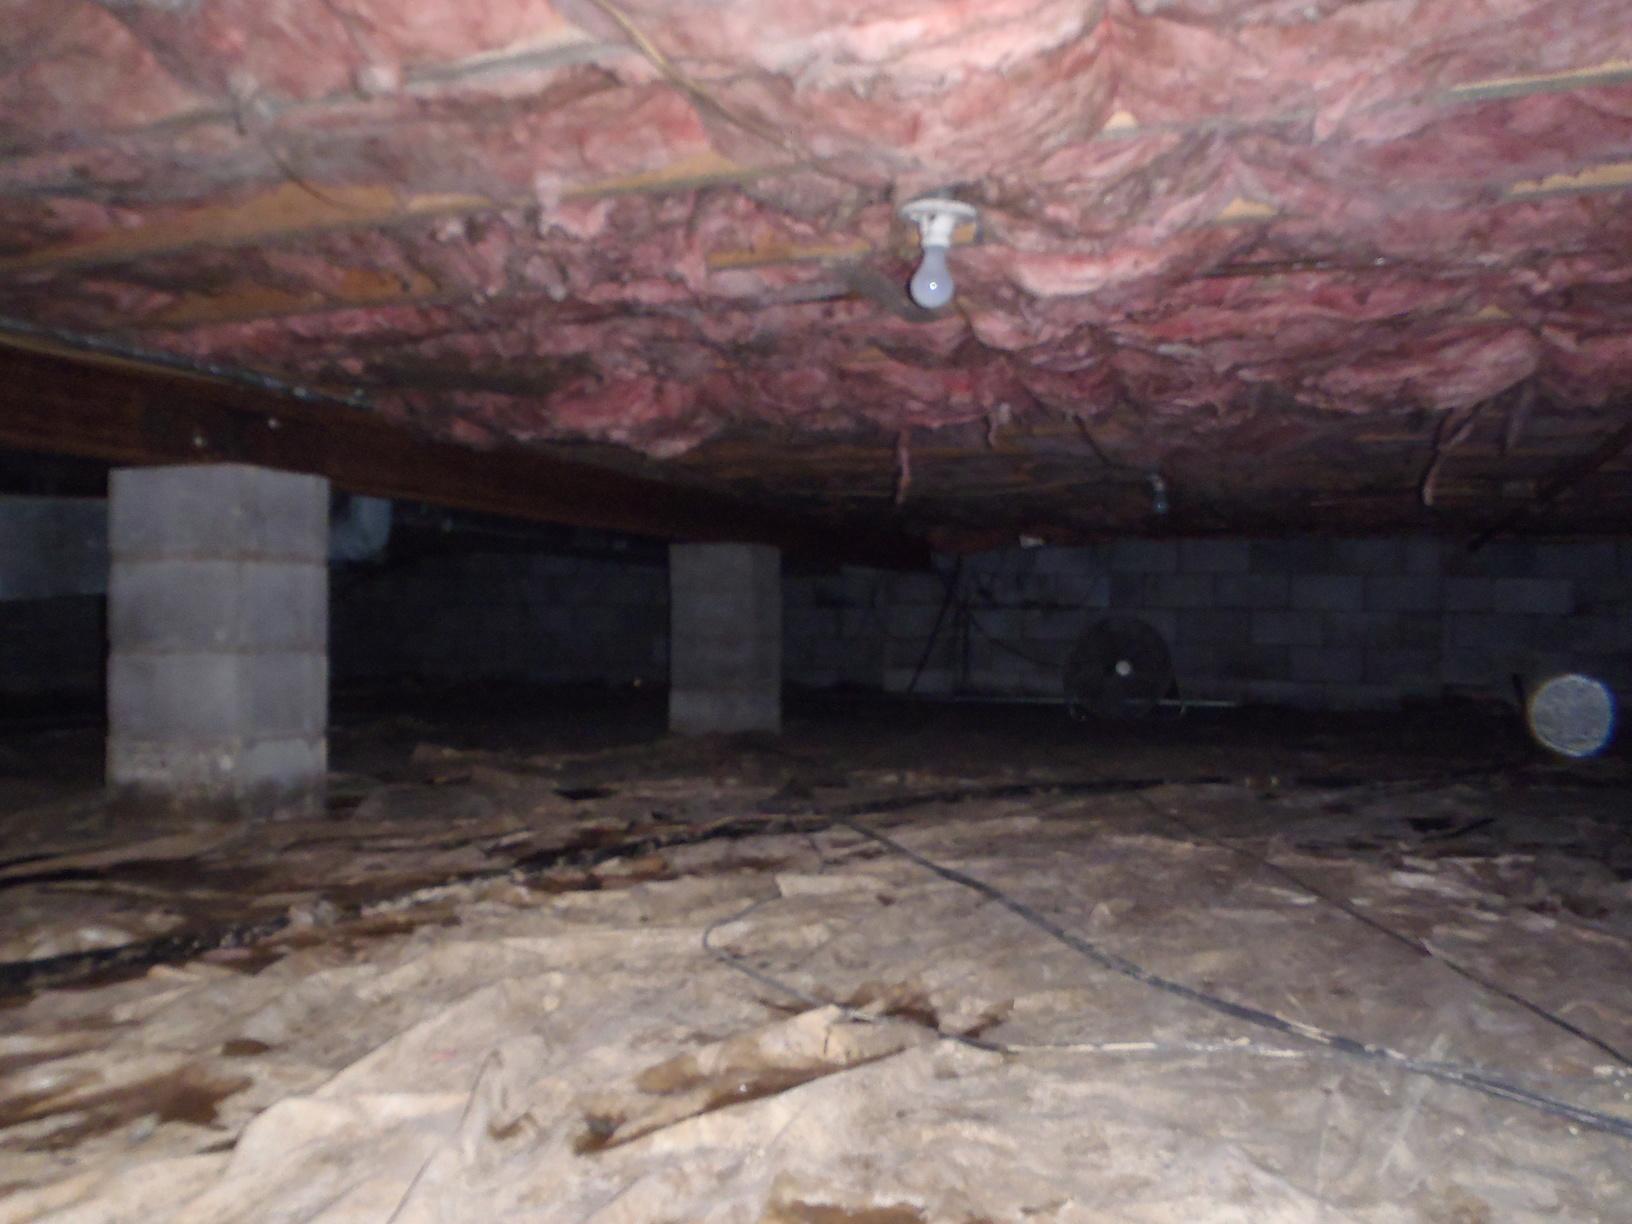 A Creepy Crawl Space in Lost Creek, West Virginia